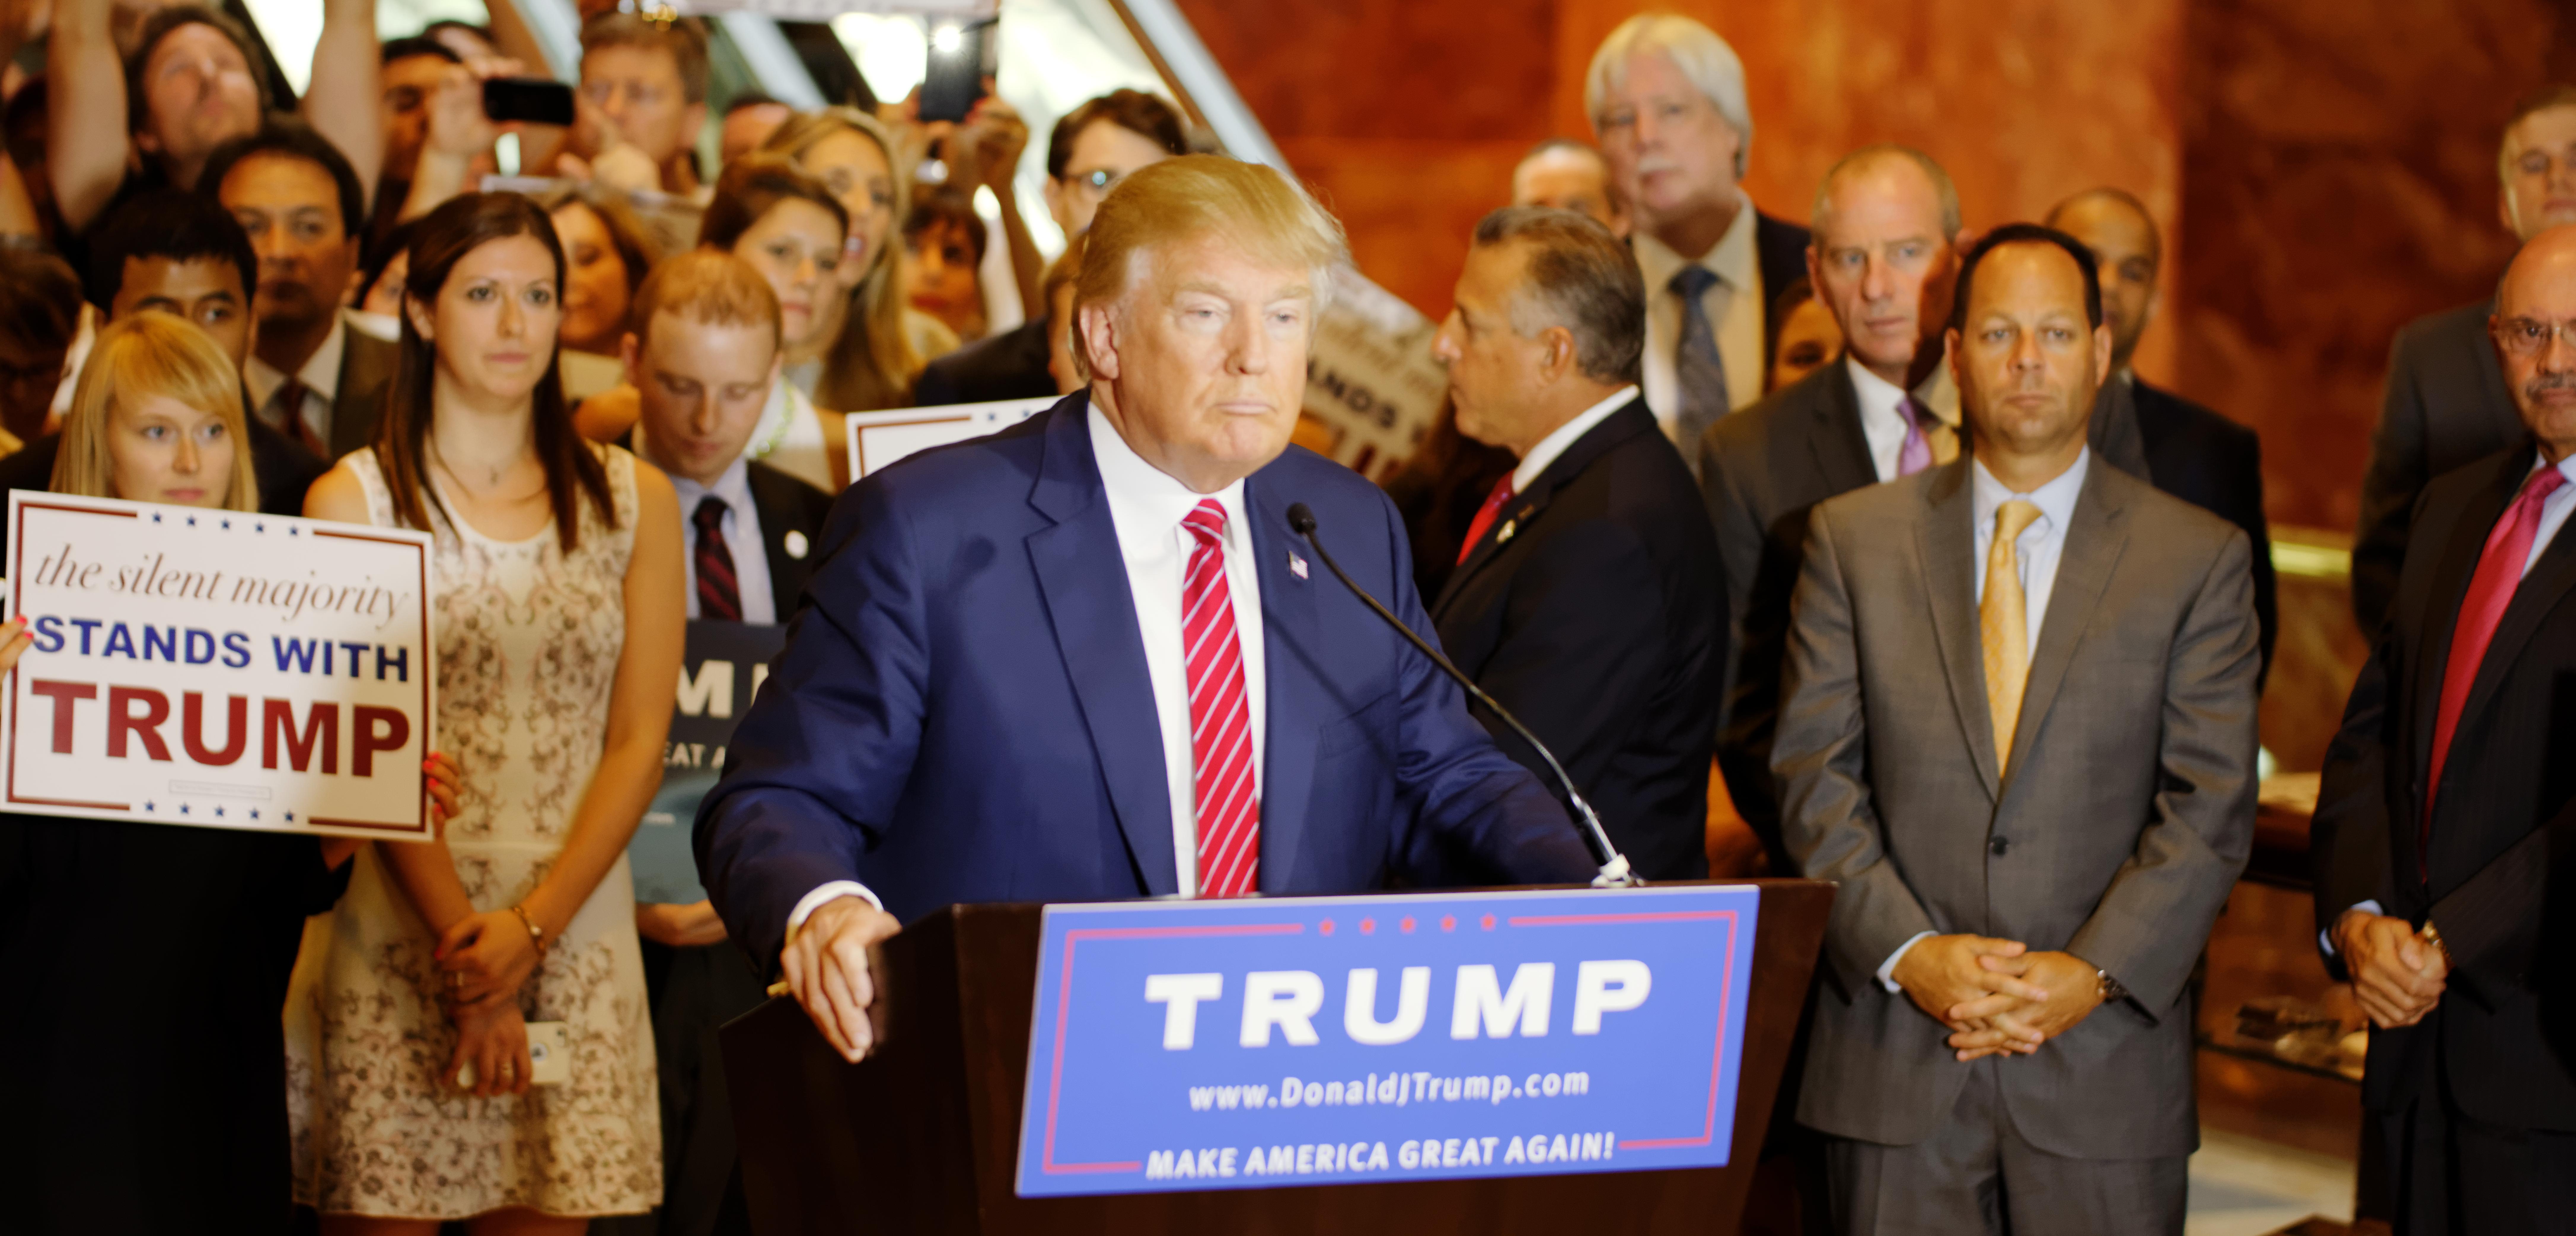 Trump declaring party loyalty, September 3, 2015, Trump Tower